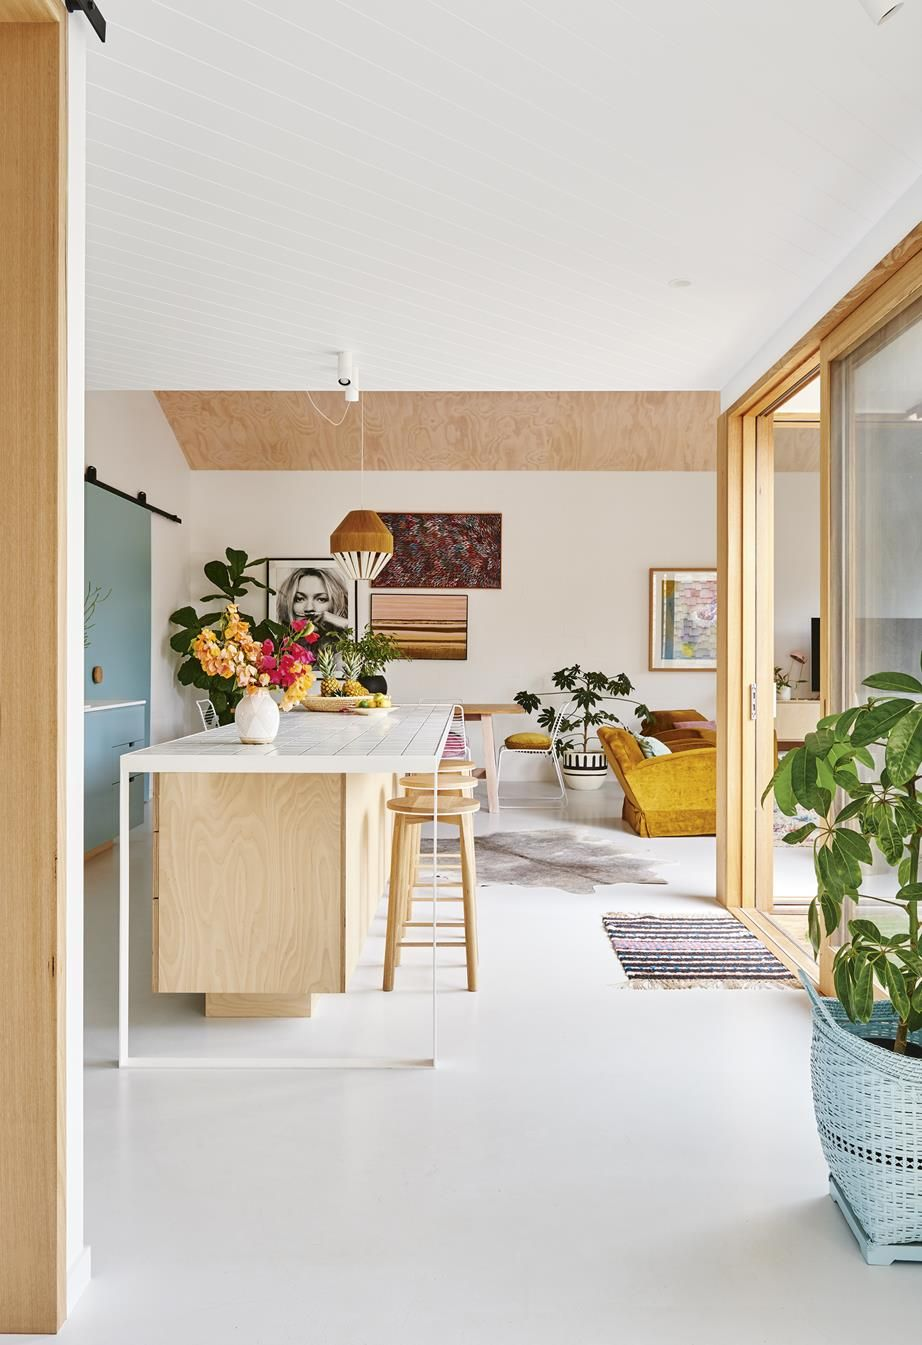 Interior stylist Emma O'Meara's colourful home with bold ideas